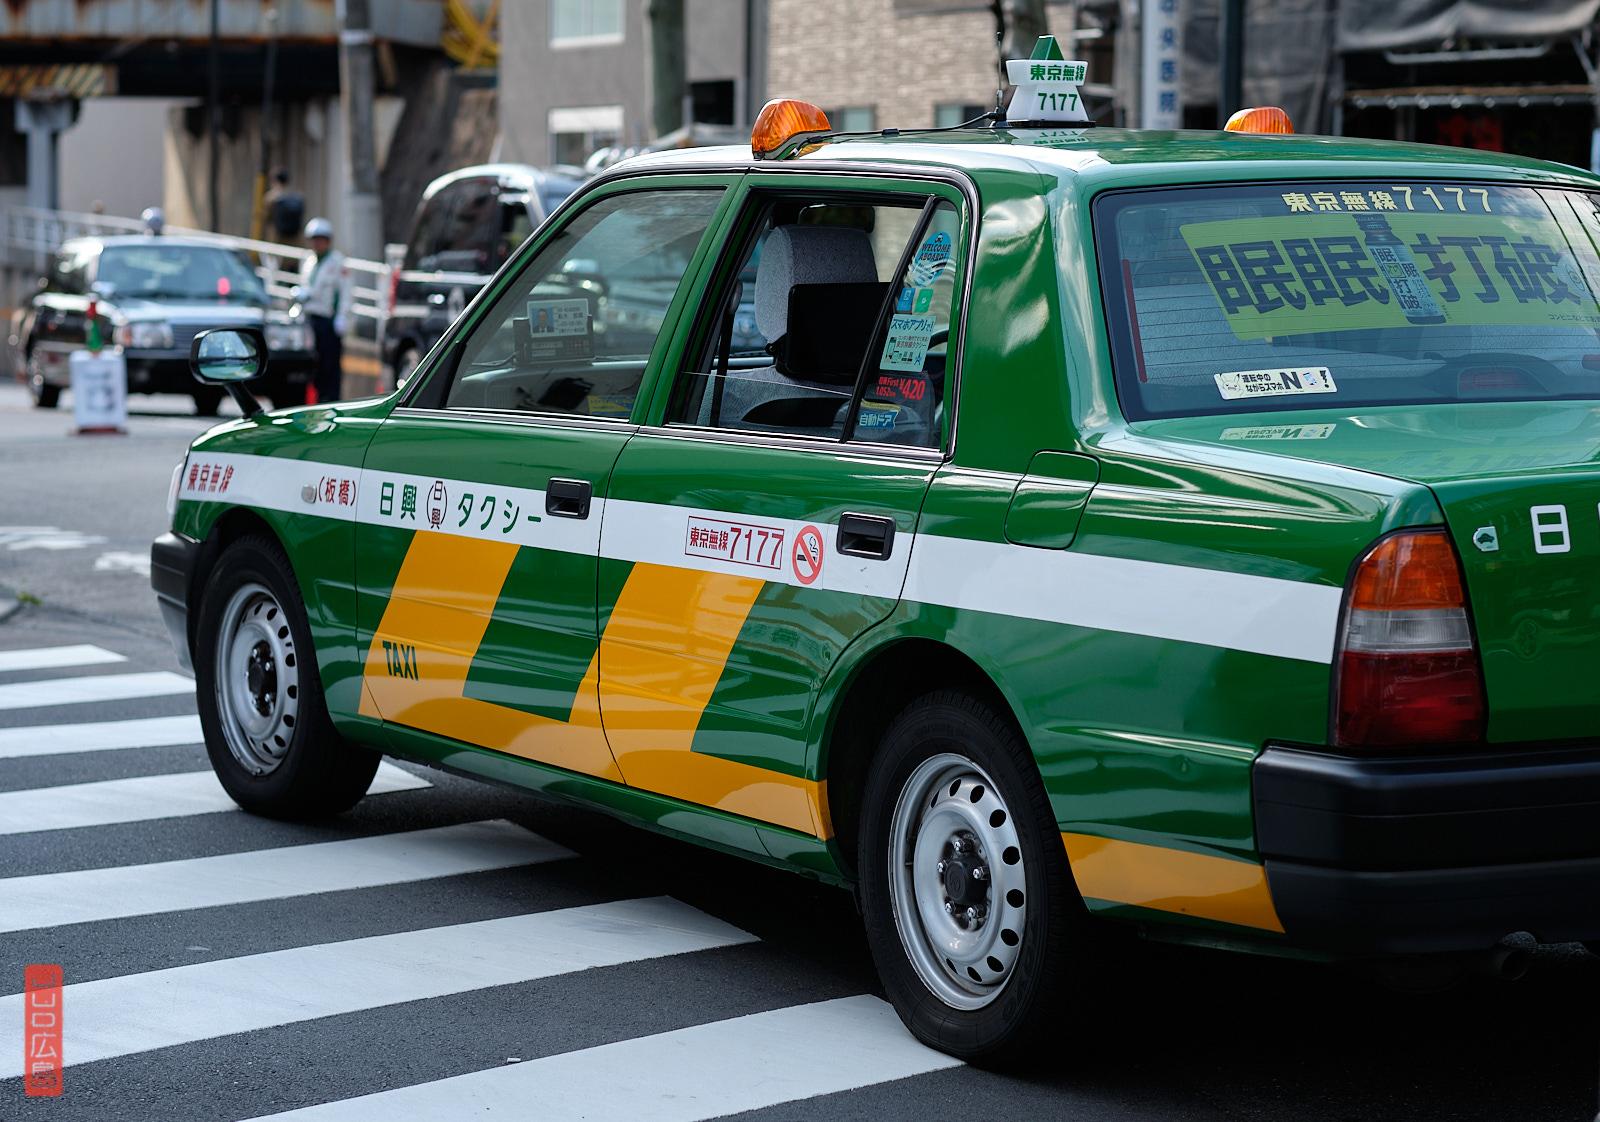 Taxi vert et jaune, Yoyogi, Tokyo, Japon